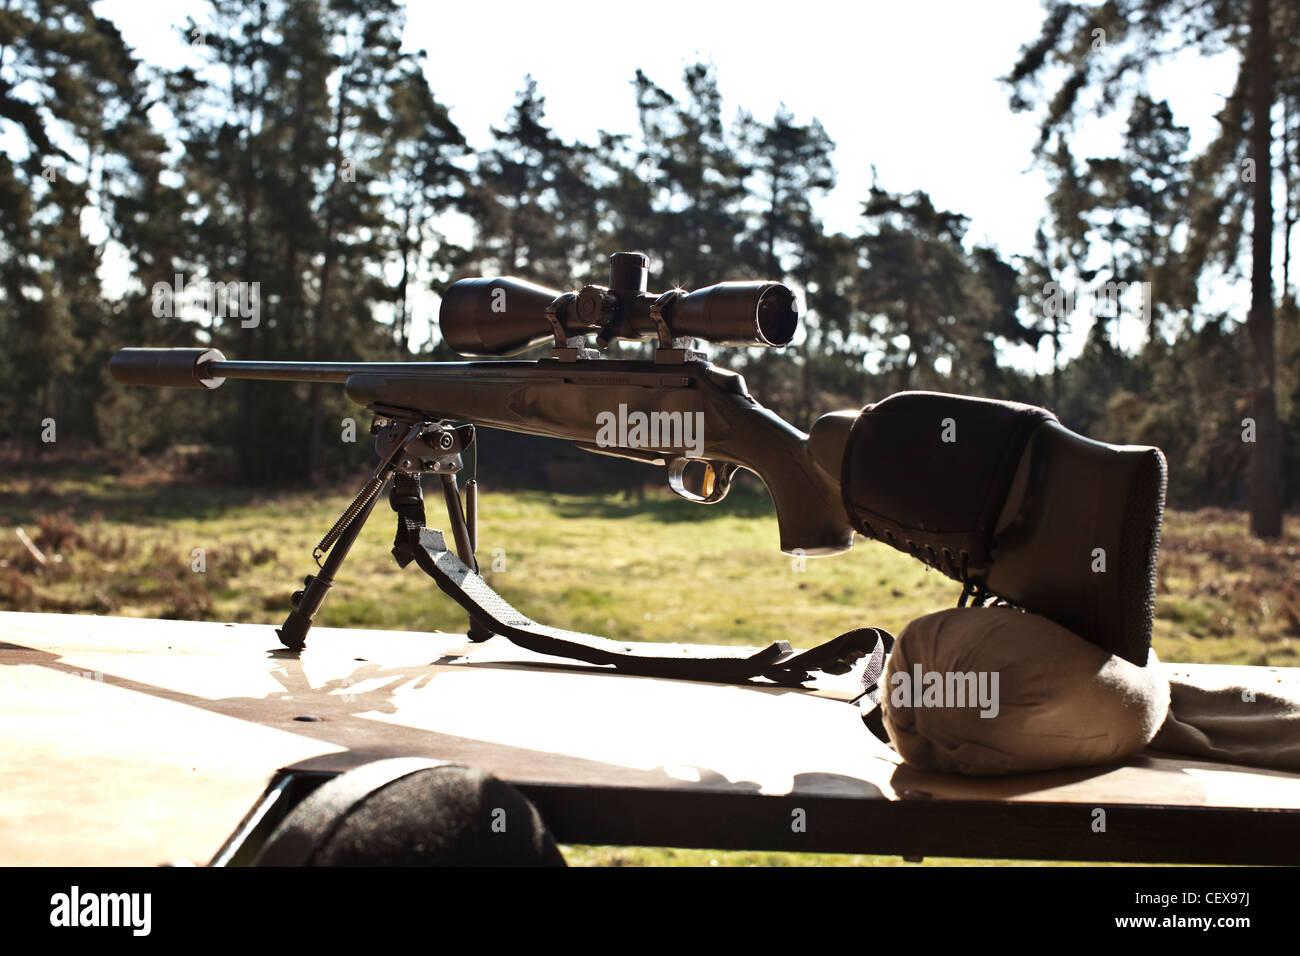 Deer hunting rifle, gun in Thetford forest, UK - Stock Image